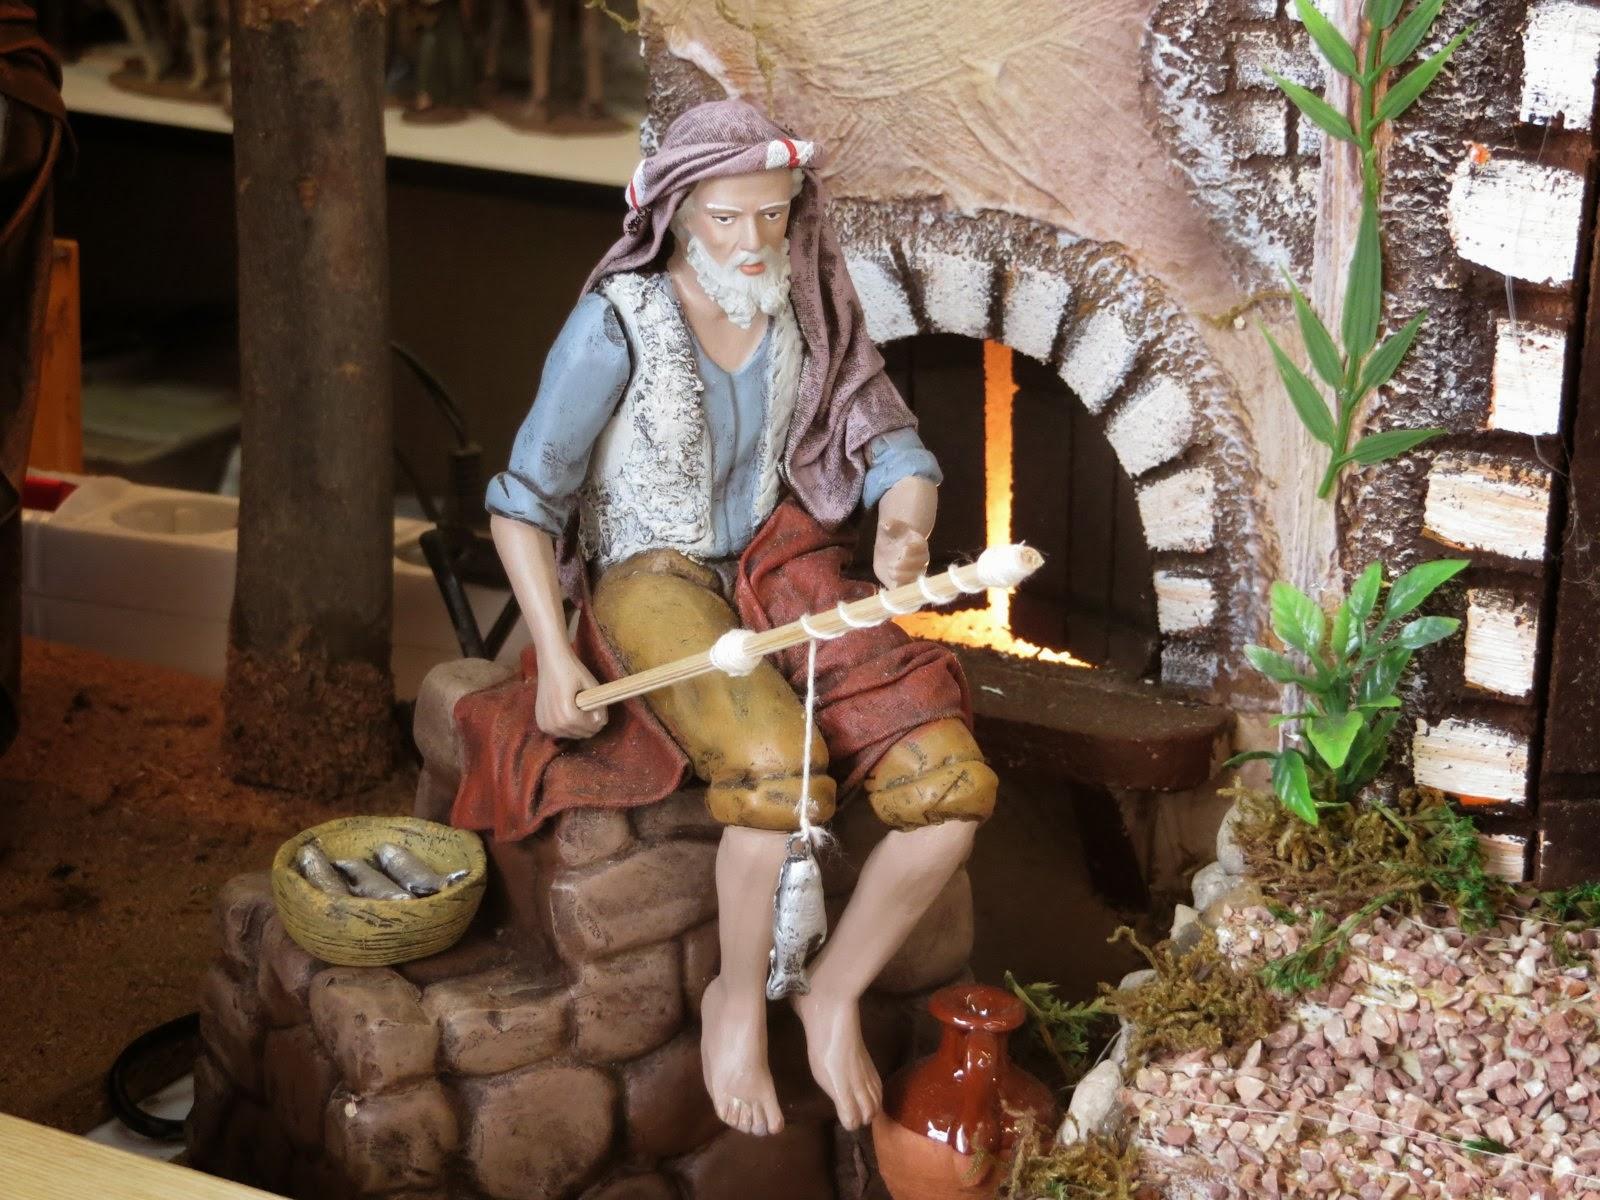 Xx feria del bel n sevilla 2013 aznalfarache - Figuritas para el belen ...